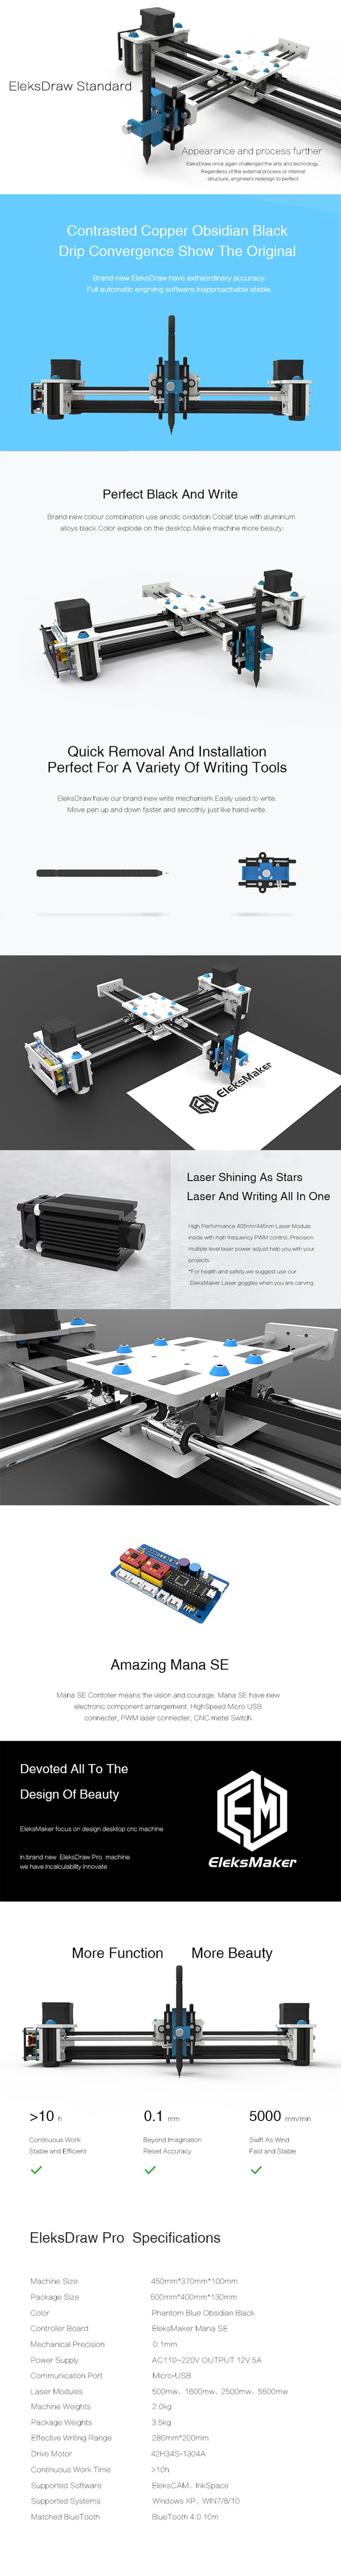 EleksMaker® EleksDraw XY Plotter Federzeichnung Maschine